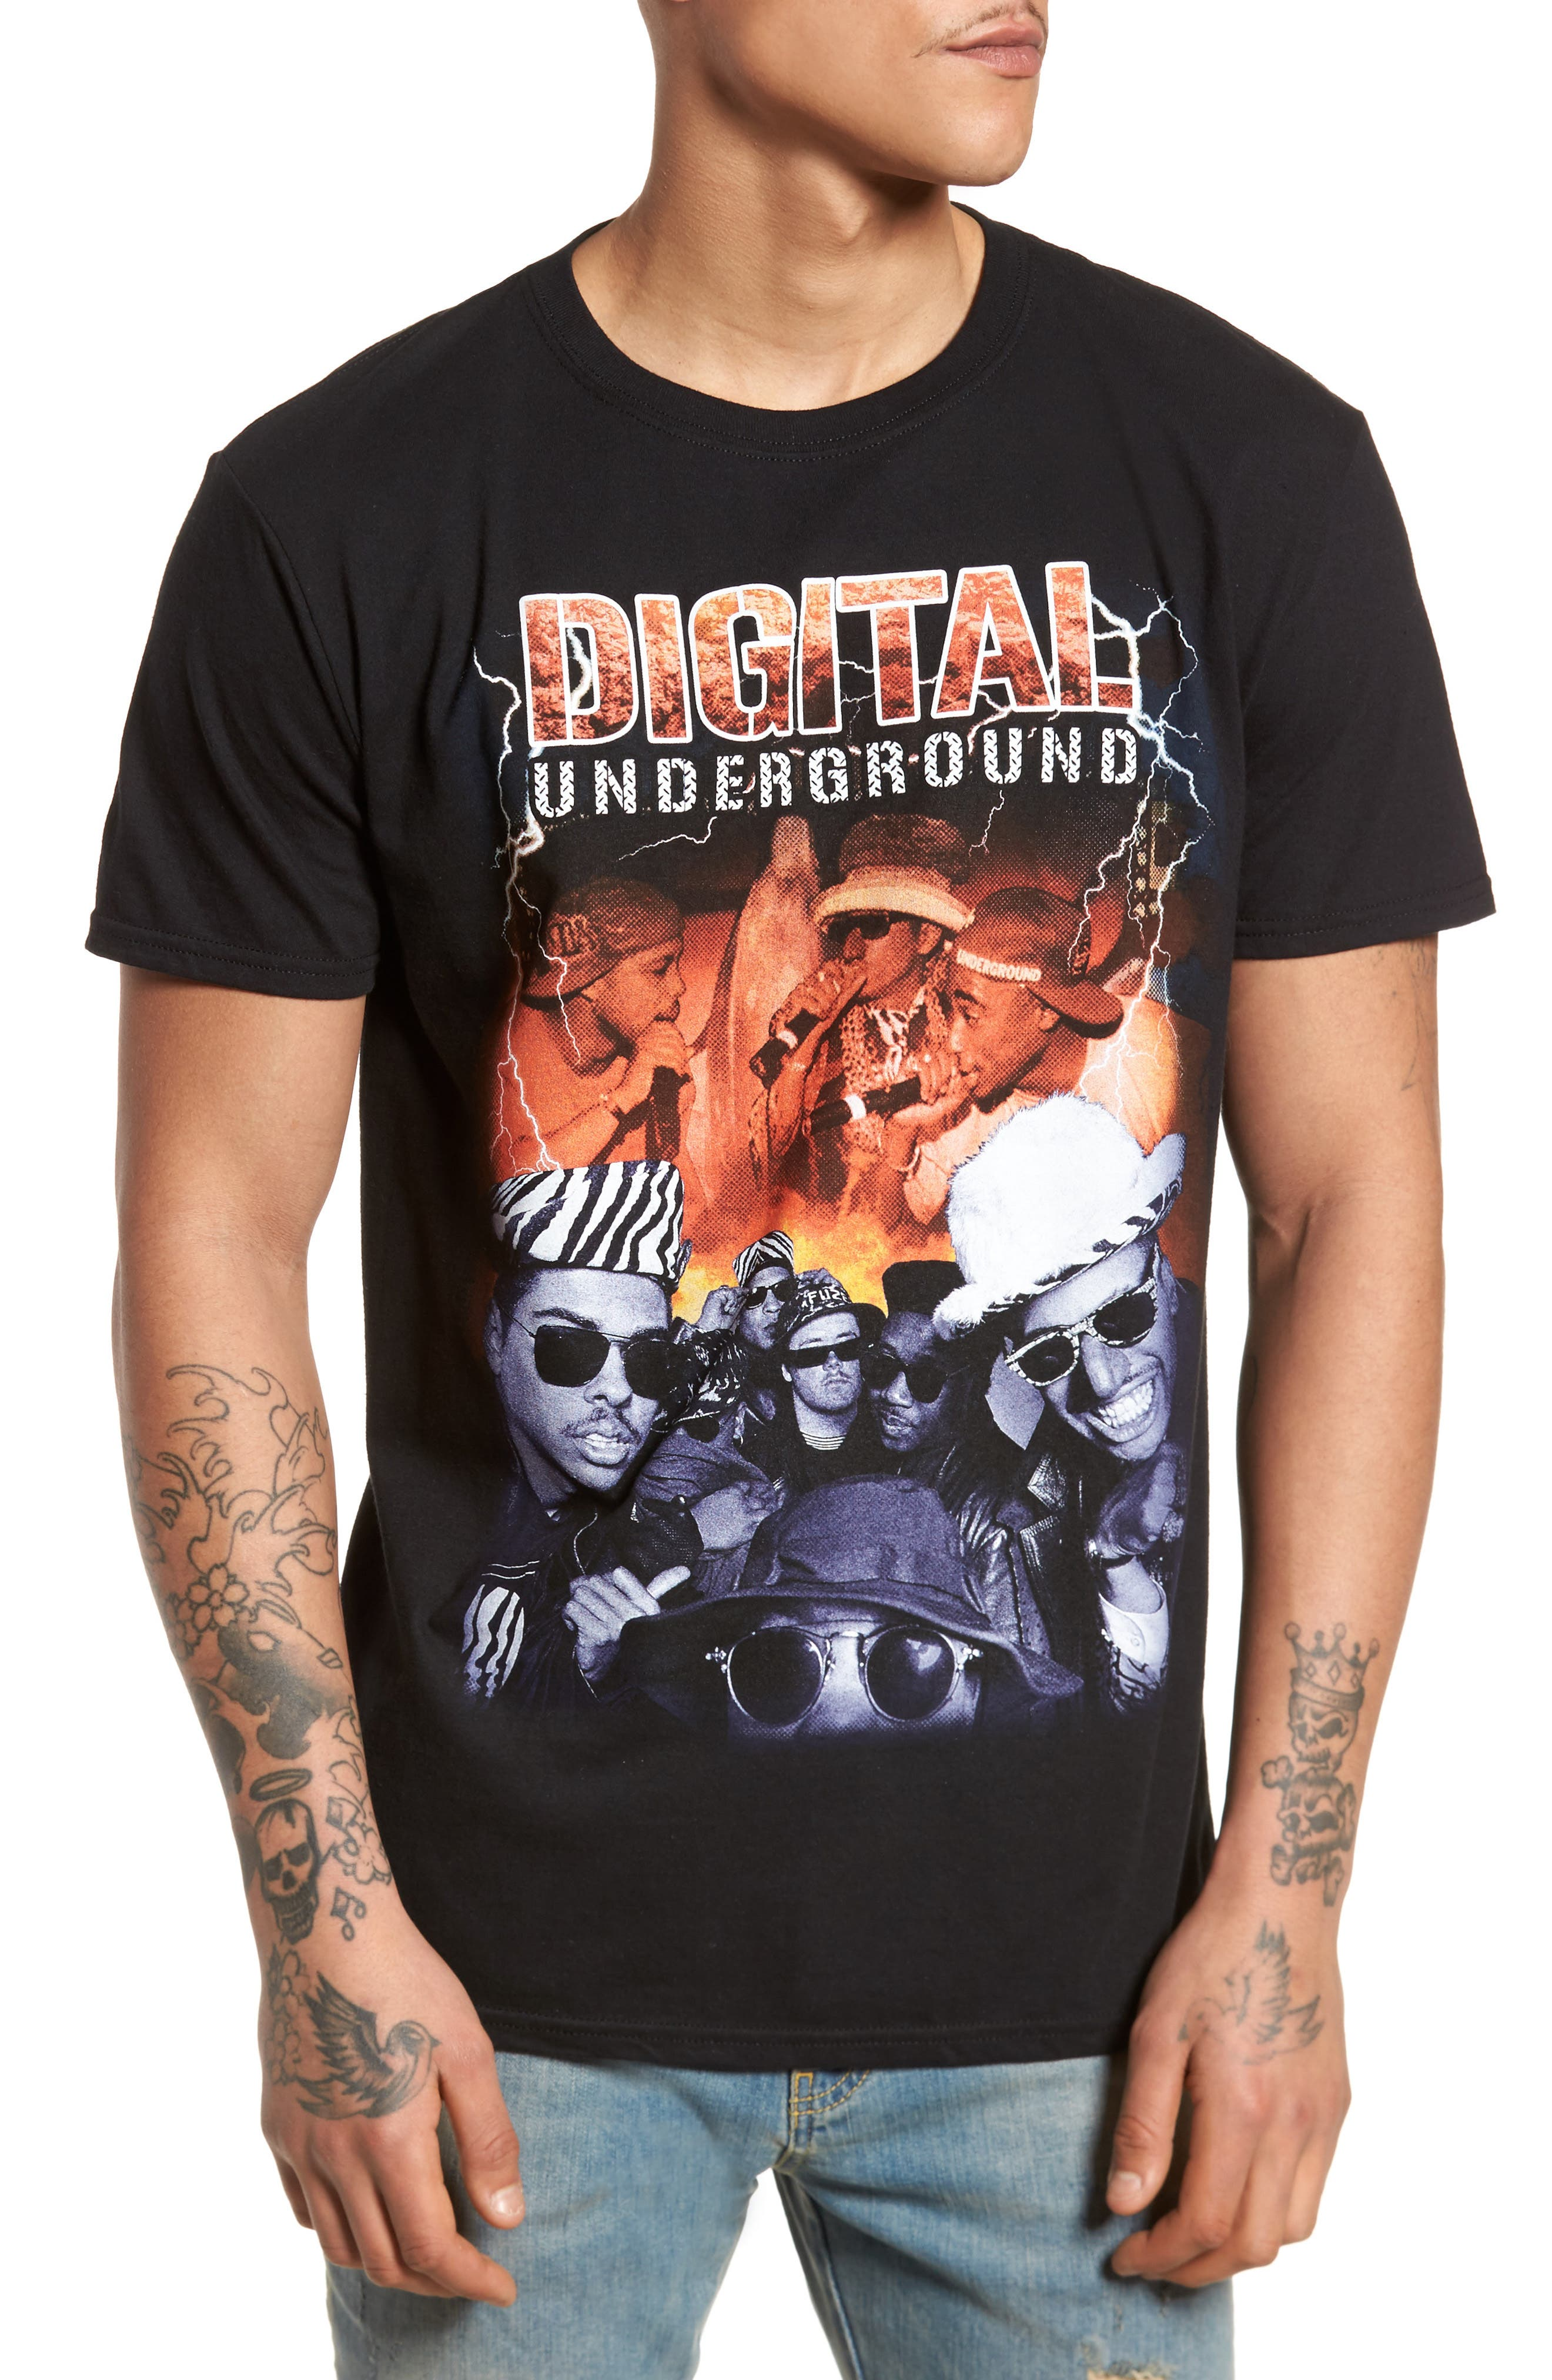 Digital Underground Graphic T-Shirt,                         Main,                         color, Black Lightning D. Underground